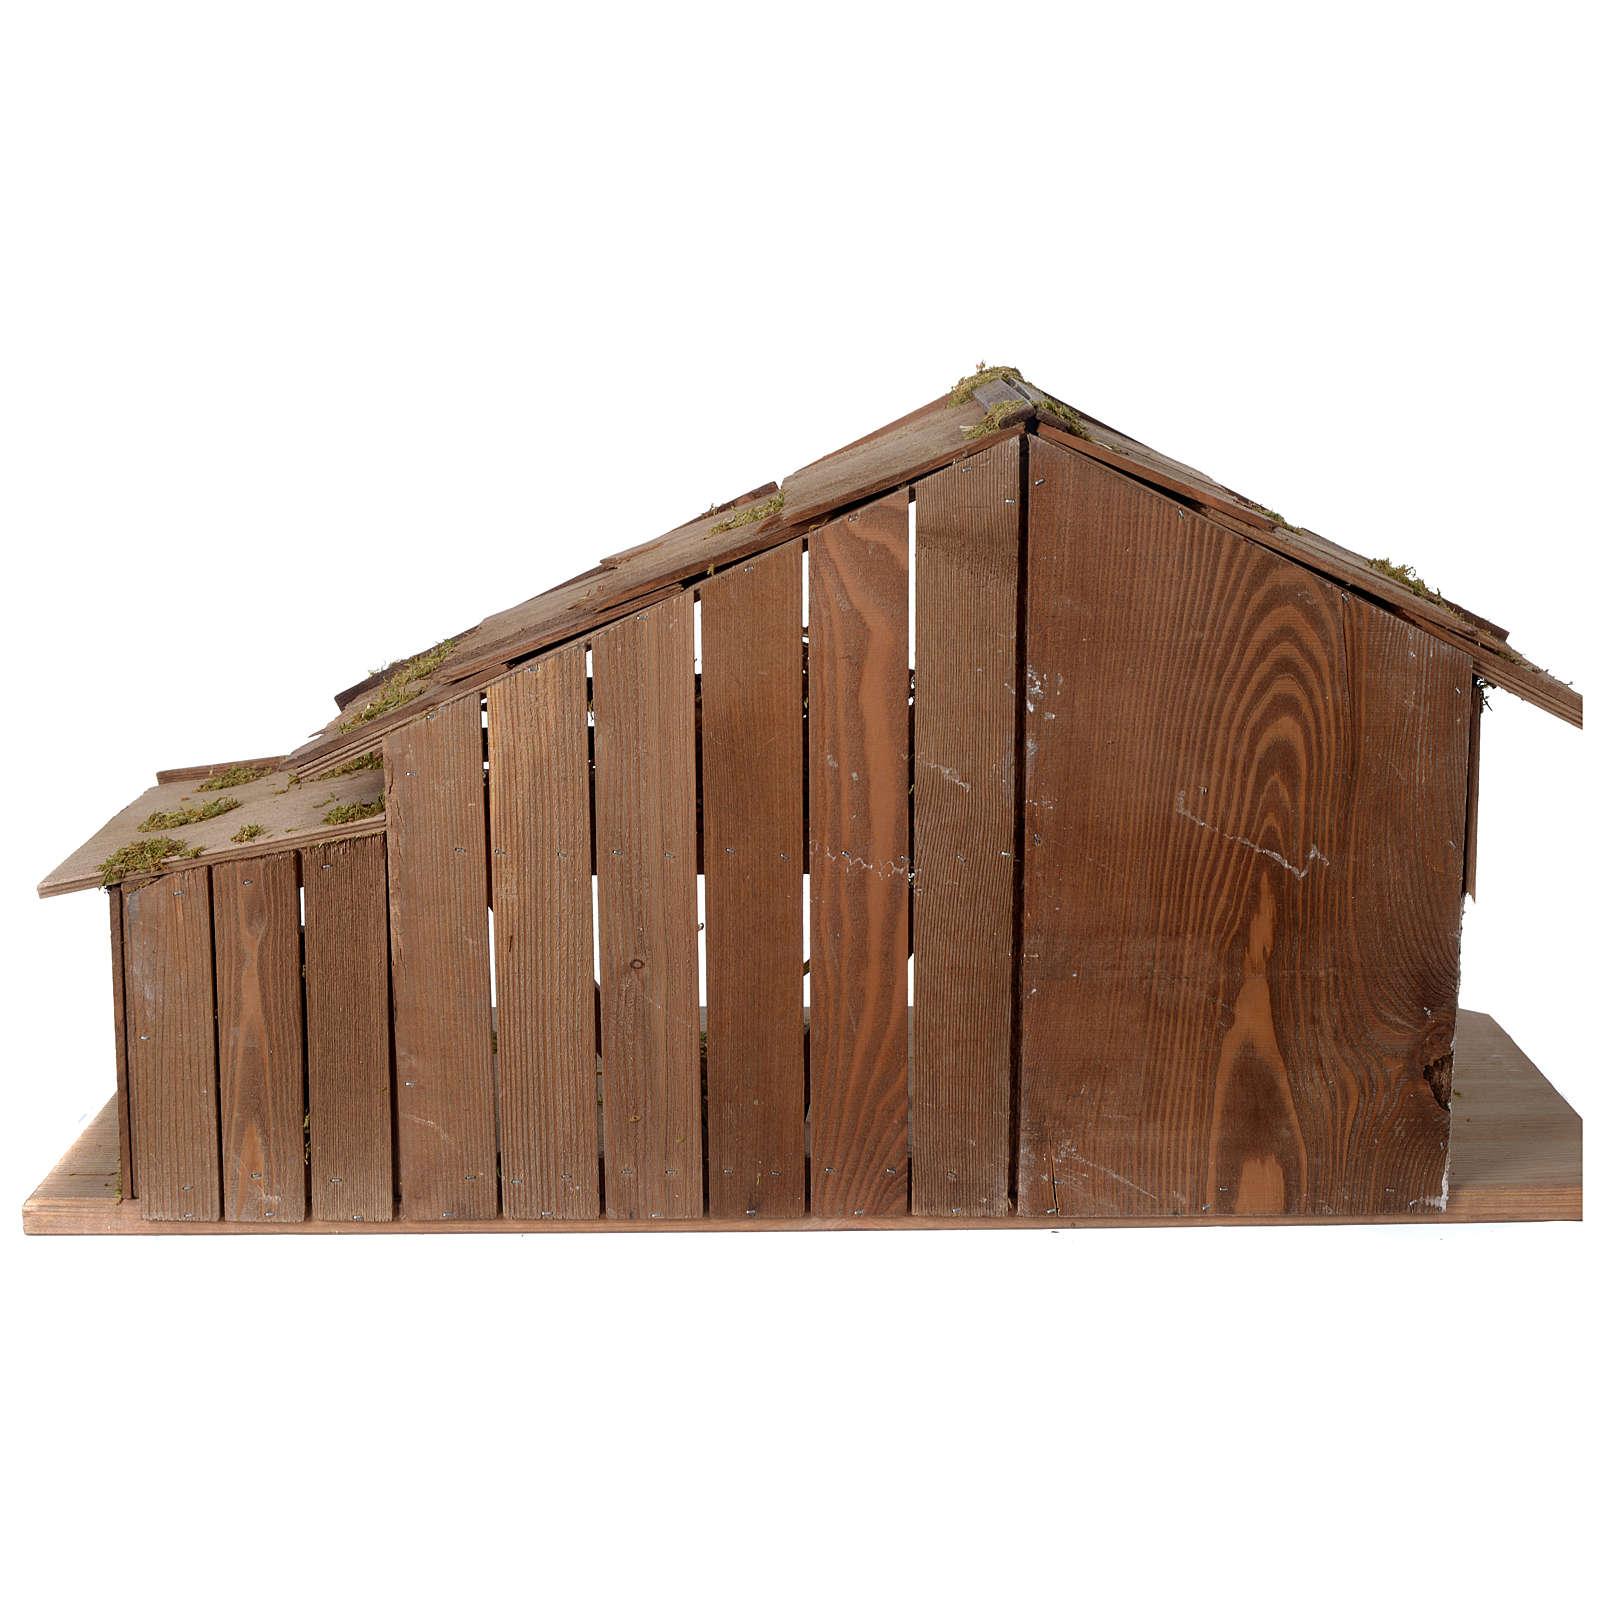 Capanna Presepe in legno stile scandinavo 40x70x30cm per statuine di 10-12 cm 4